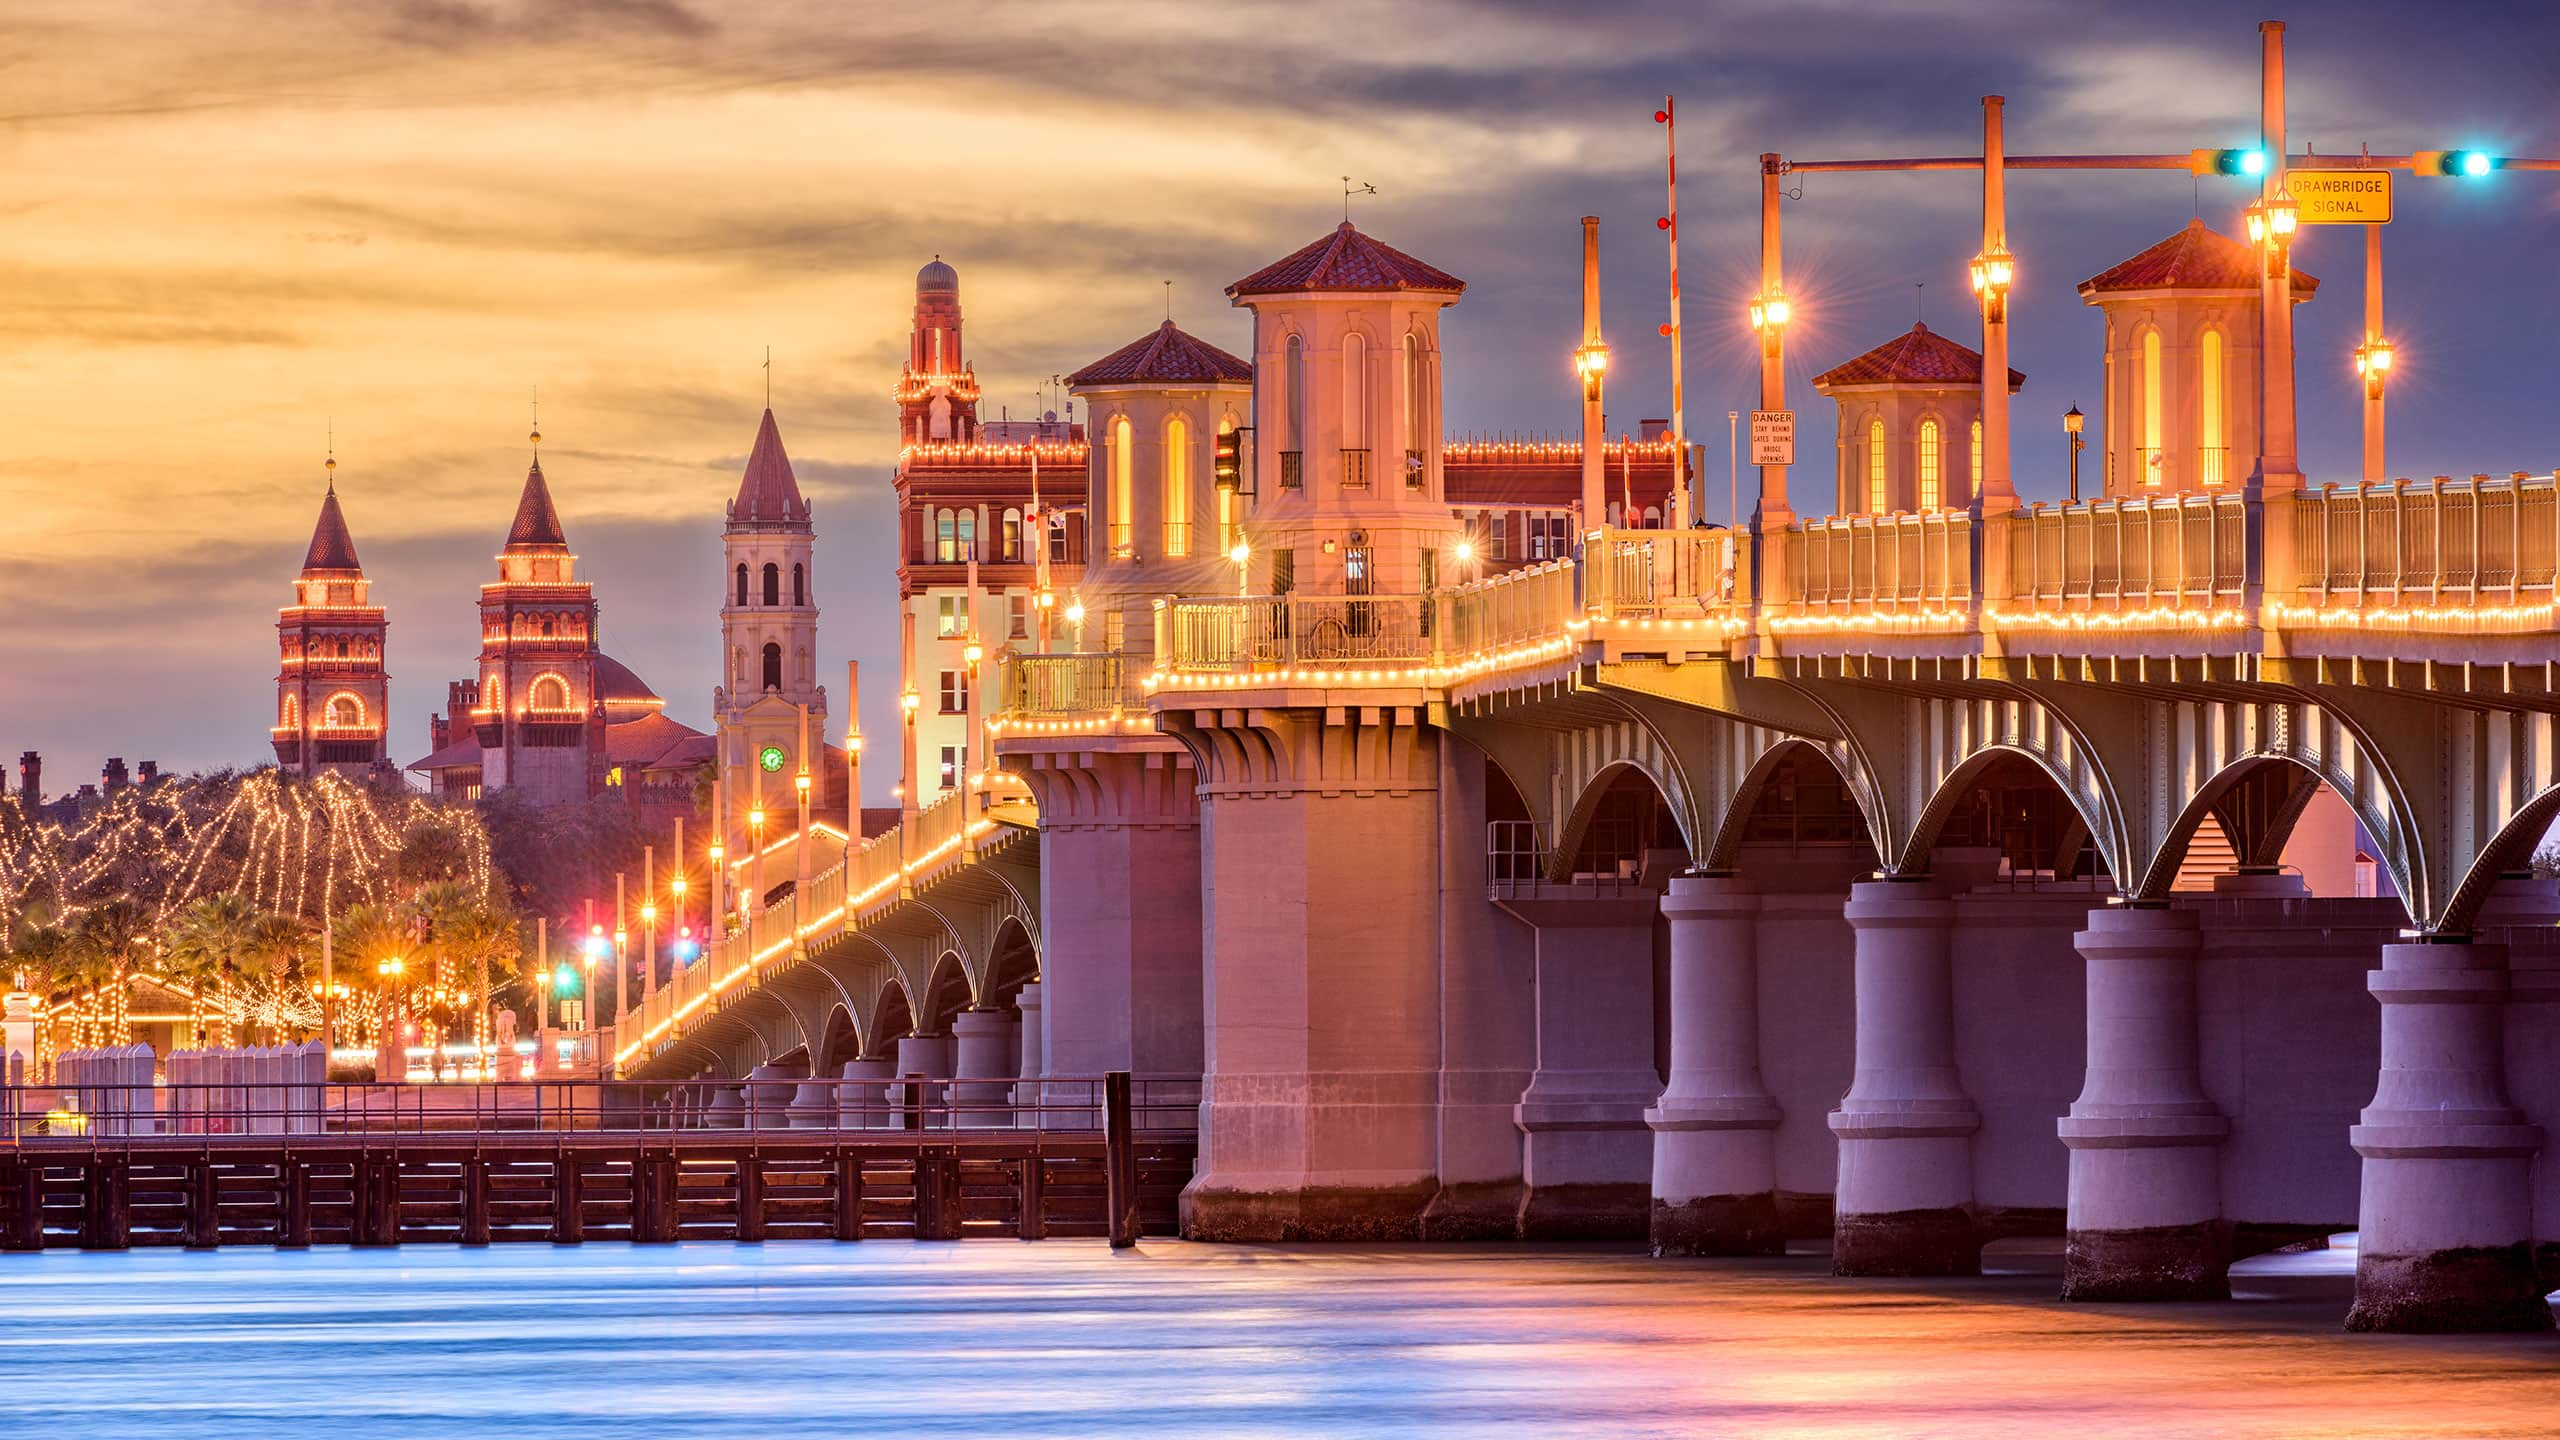 Florida-League-of-Cities-homepage-image.jpg